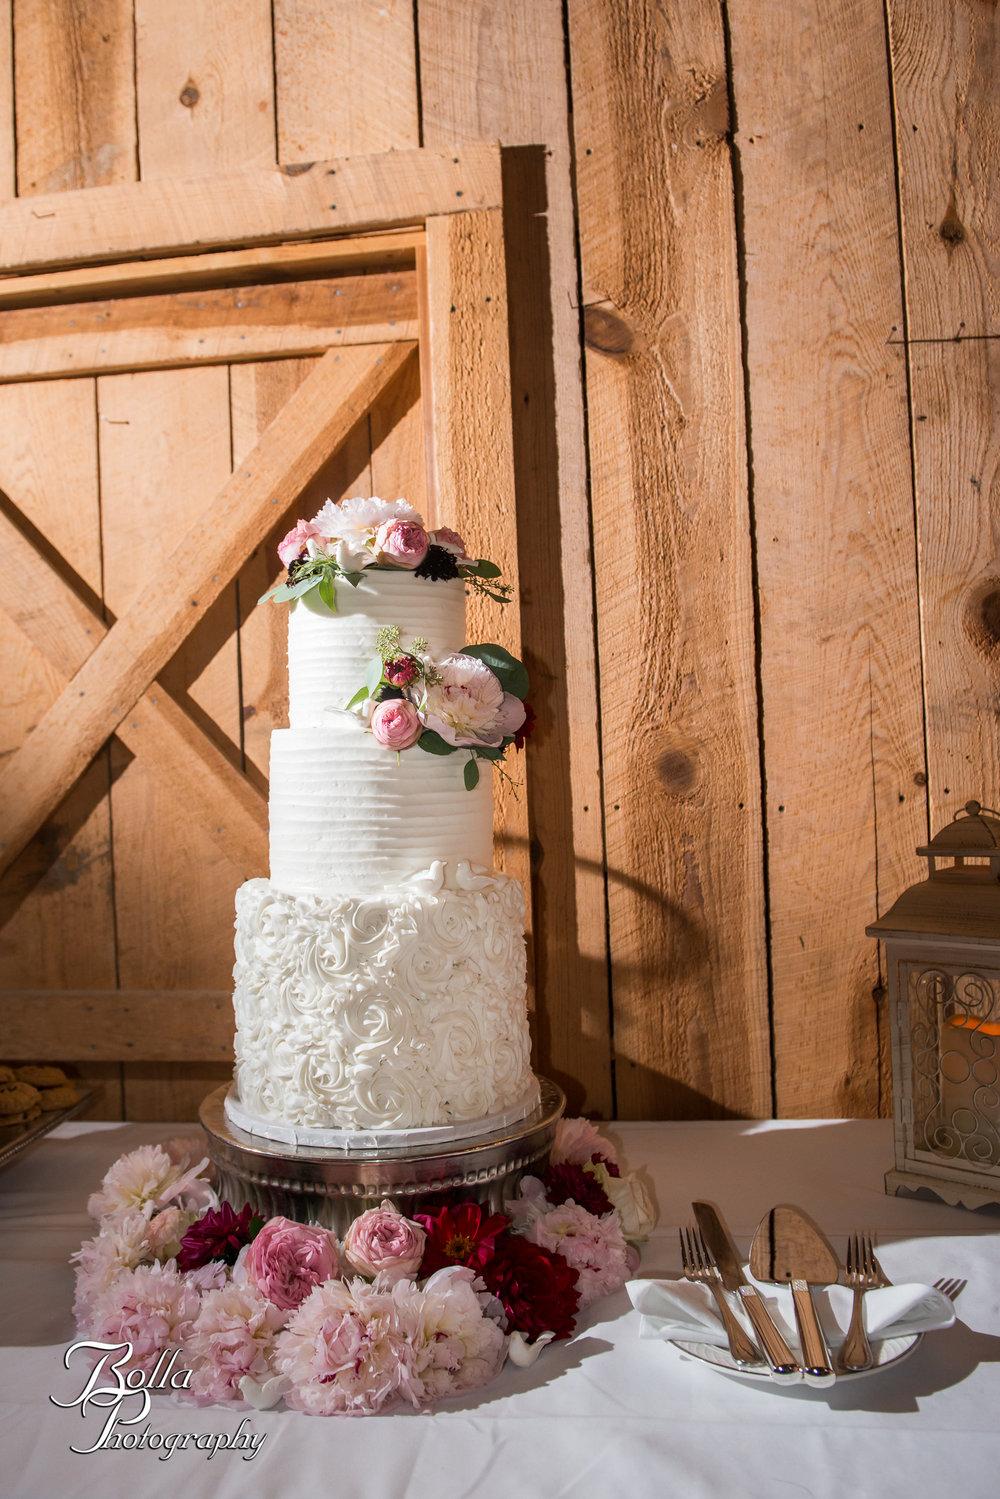 Bolla_photography_edwardsville_wedding_photographer_st_louis_weddings_Chaumette_winery_Mikusch-0495.jpg